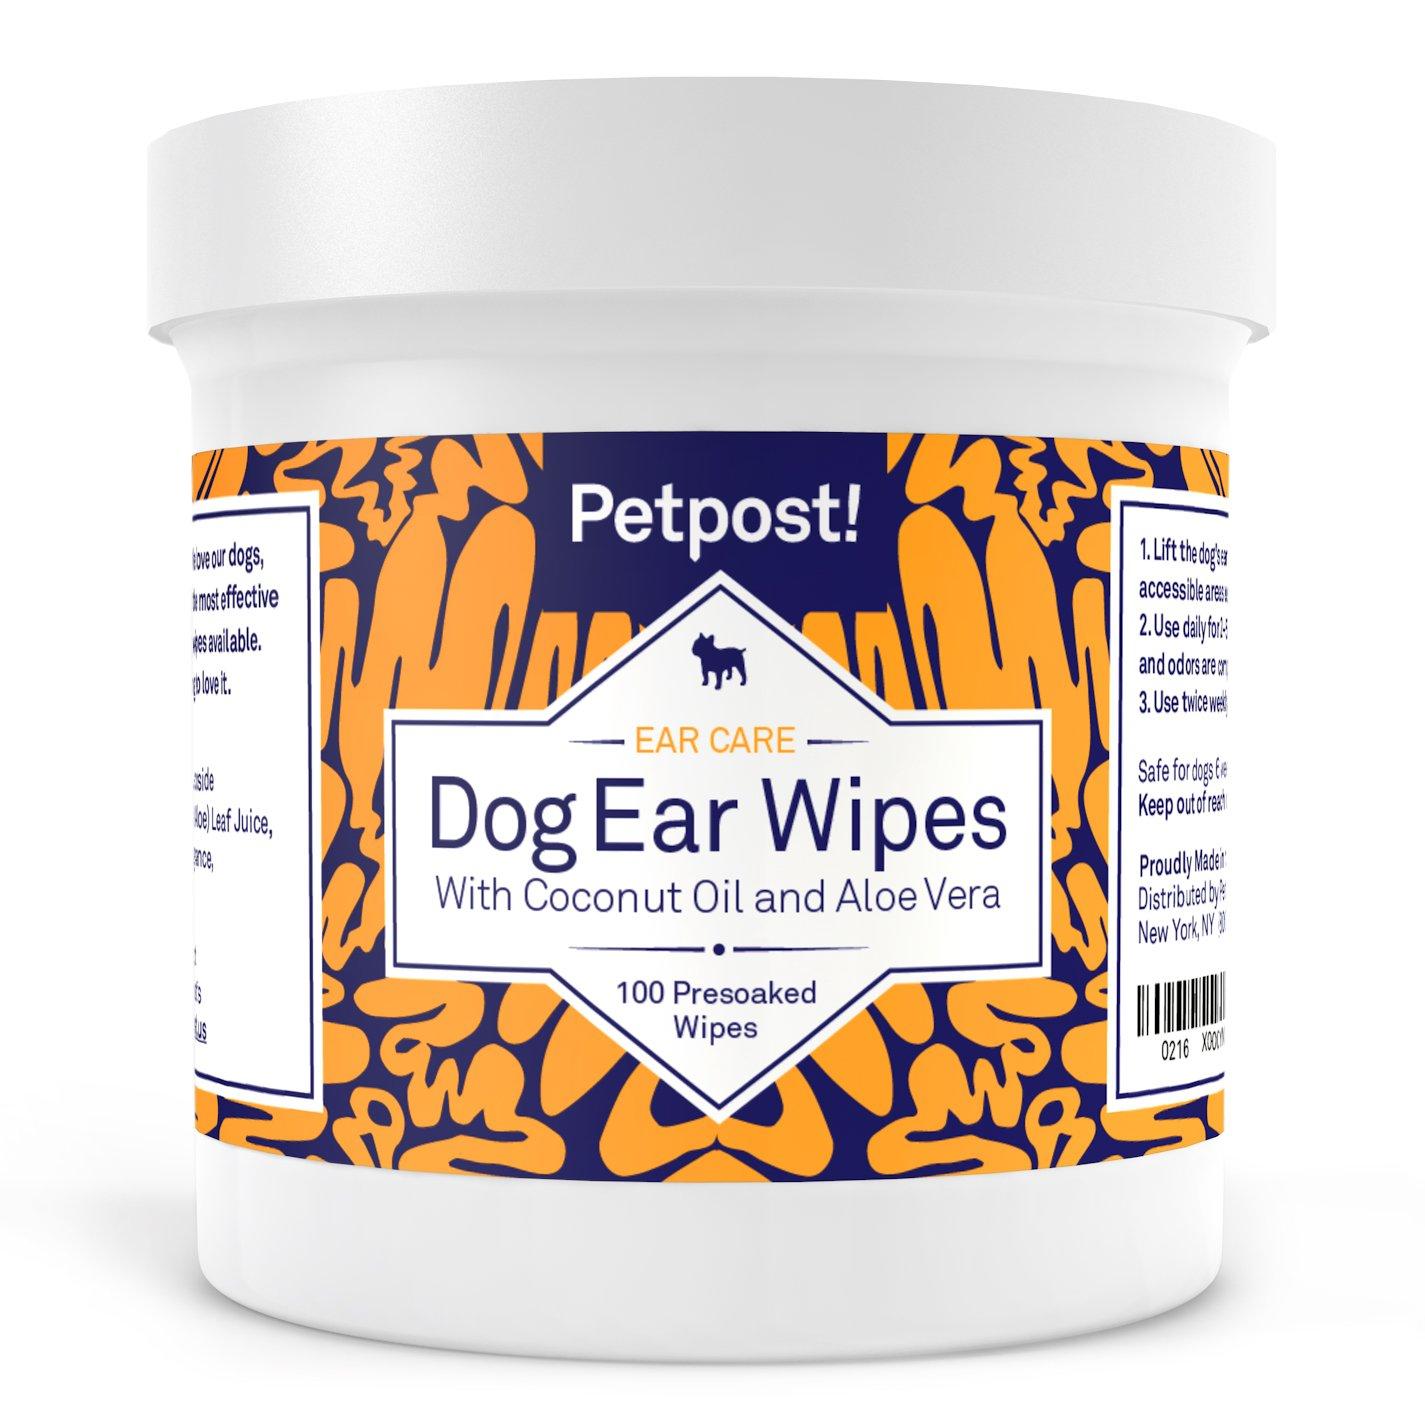 Petpost Ohrenreiniger für Hunde - 100 Ultra-Weiche Wattetücher getränkt in Kokosnussöl/Aloe Lösung - Pflege bei Ohrmilben & Ohrinfektionen